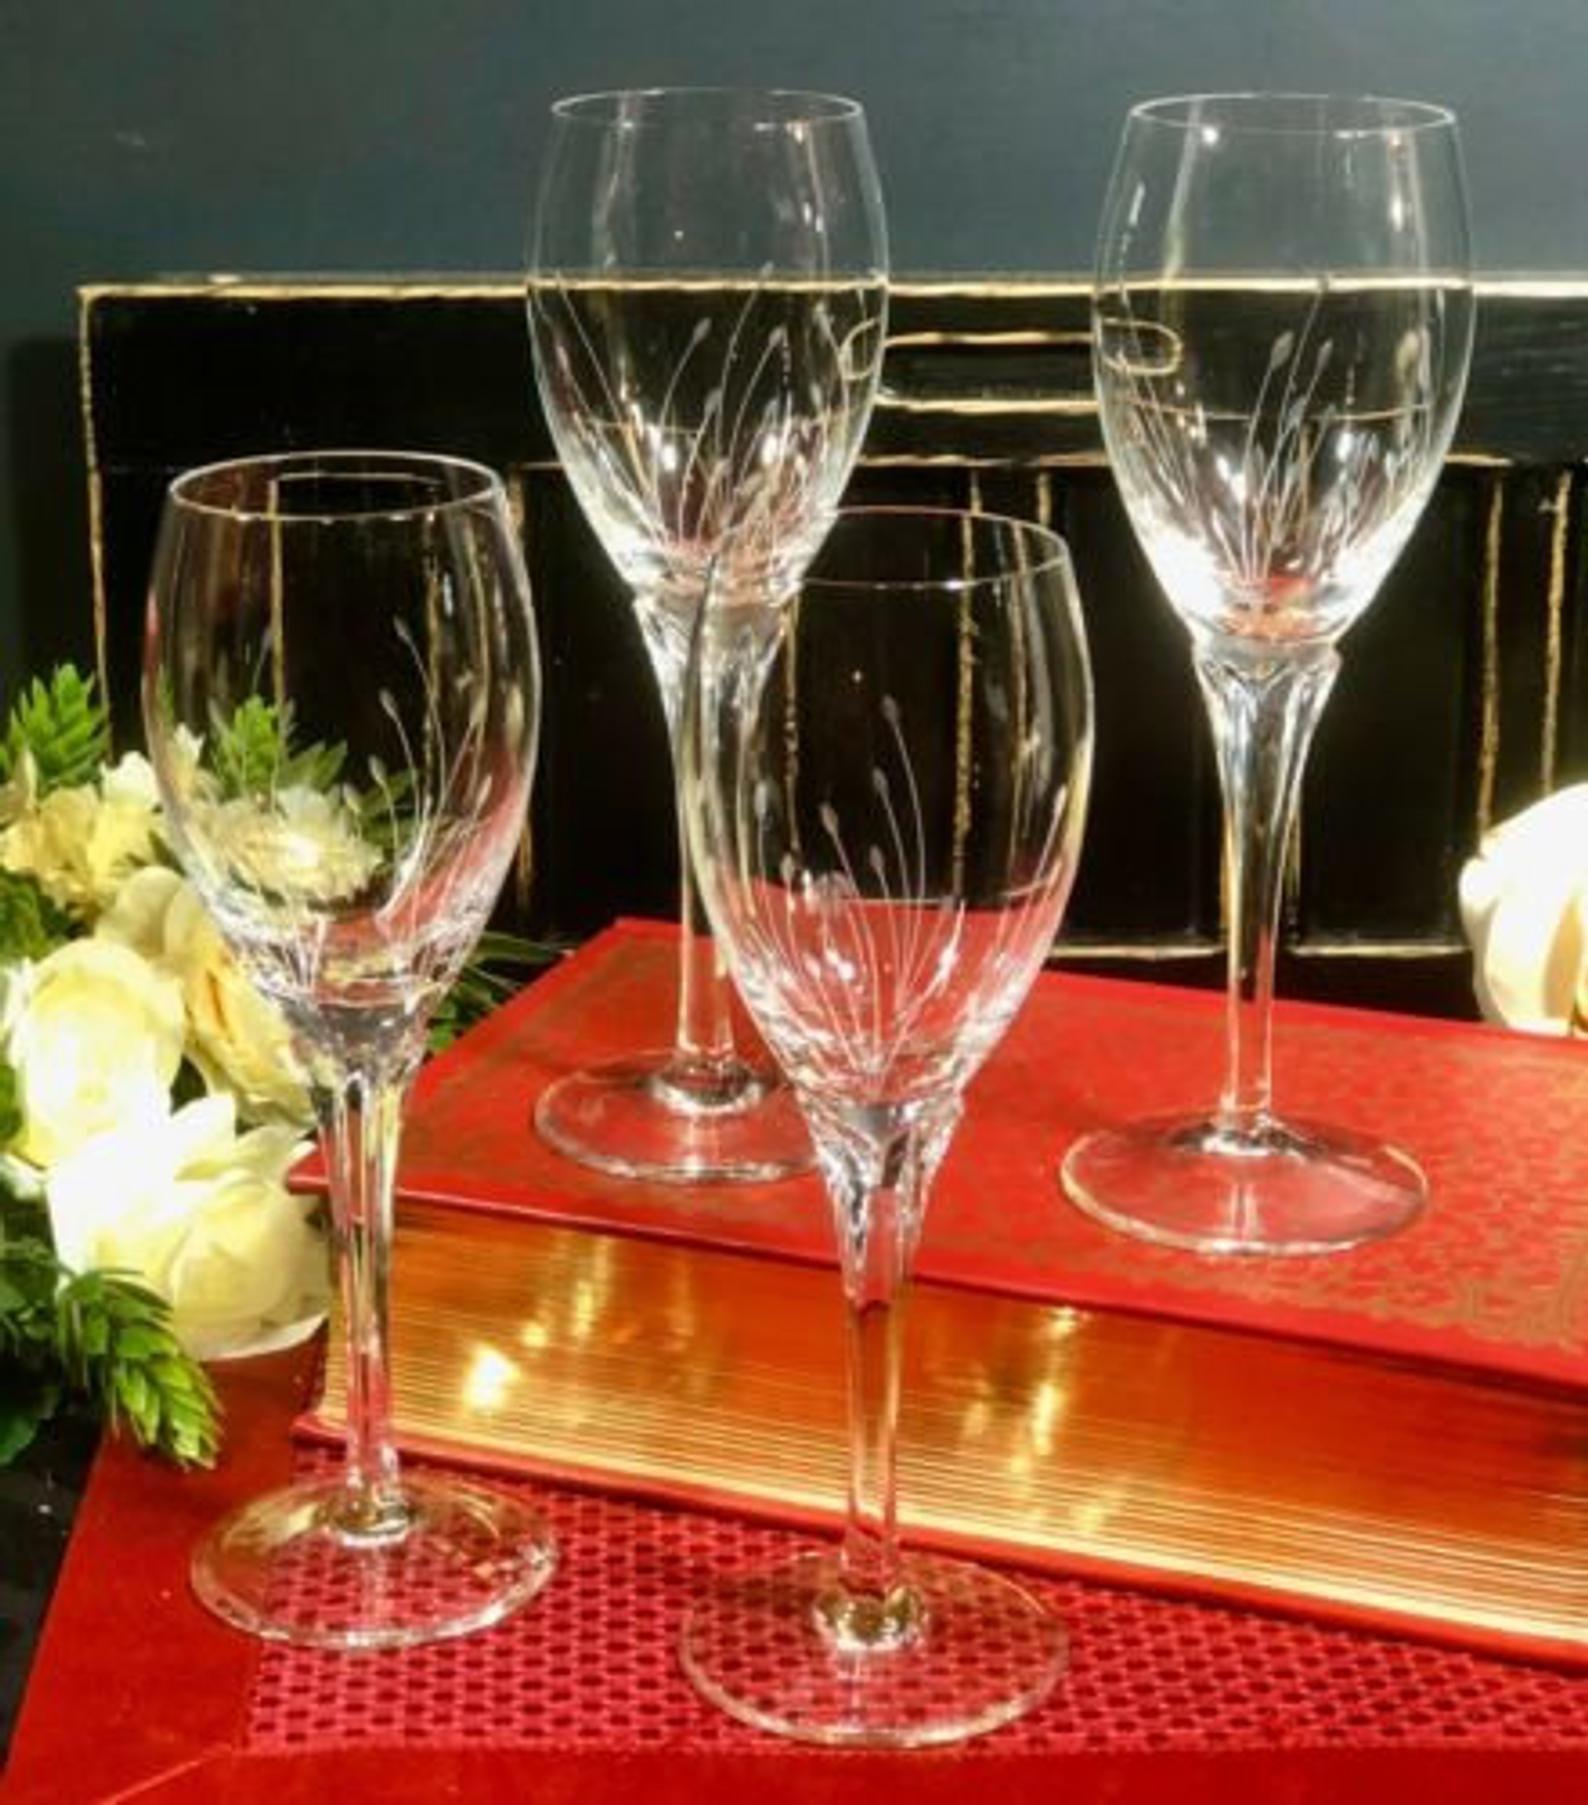 4 Gorham Jolie Tall Vintage Crystal Wine Glasses Blown Etched Floral Discount In 2020 Crystal Wine Glasses Vintage Crystal Fireplace Tool Set